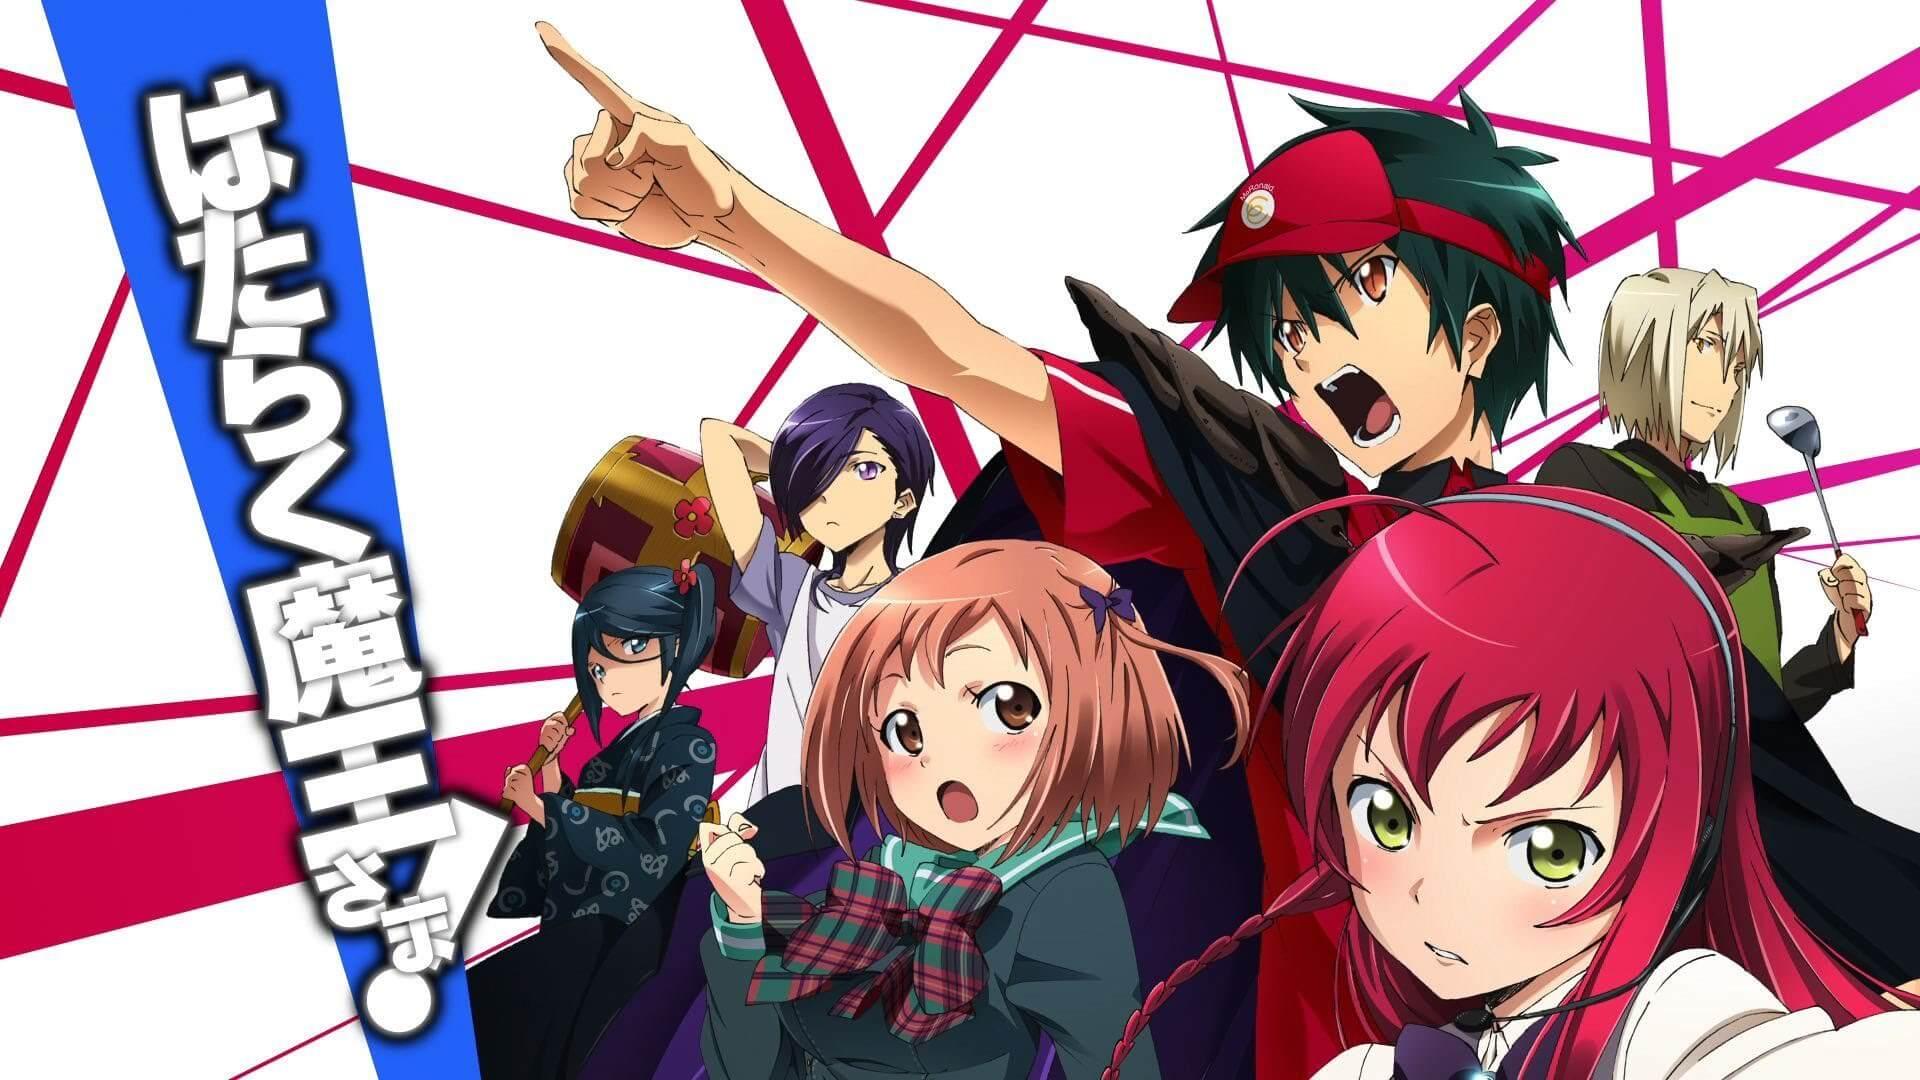 HATARAKU MAOU-SAMA – LIGHT NOVEL ANUNCIA VOLUME FINAL!